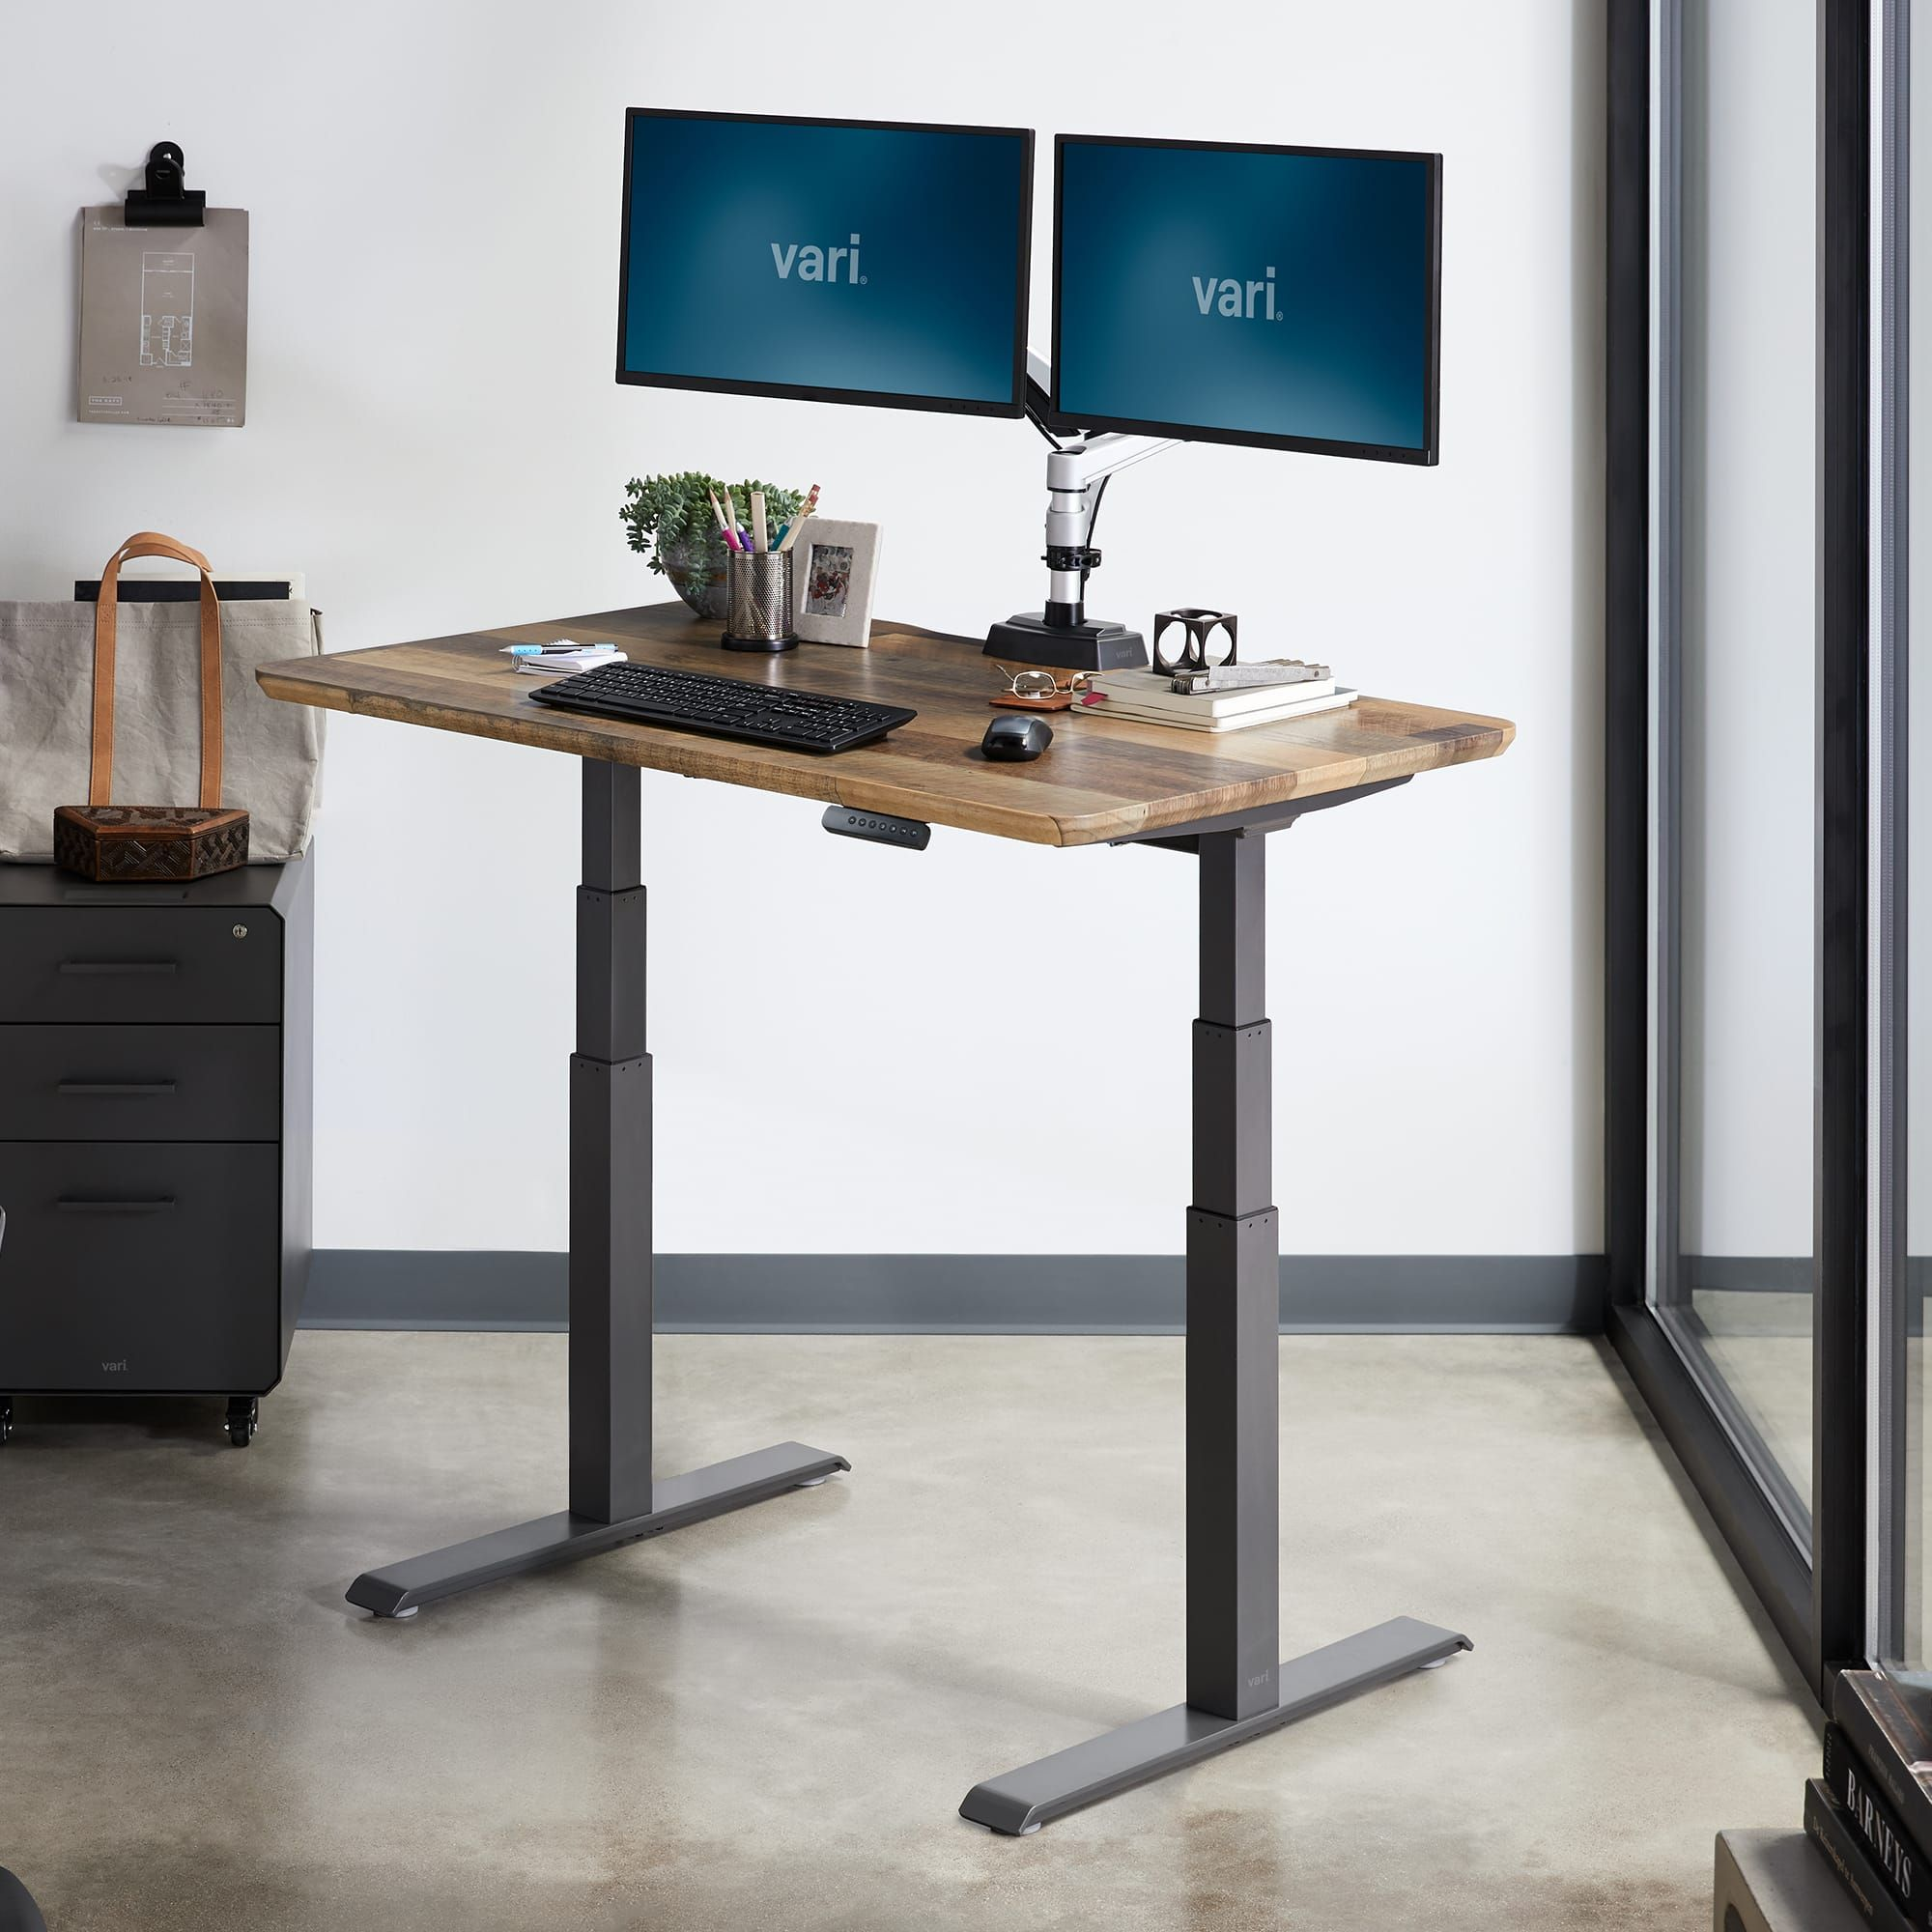 Electric Standing Desk 48x30 Height Adjustable Electric Desk Vari In 2020 Electric Standing Desk Adjustable Standing Desk Adjustable Height Standing Desk